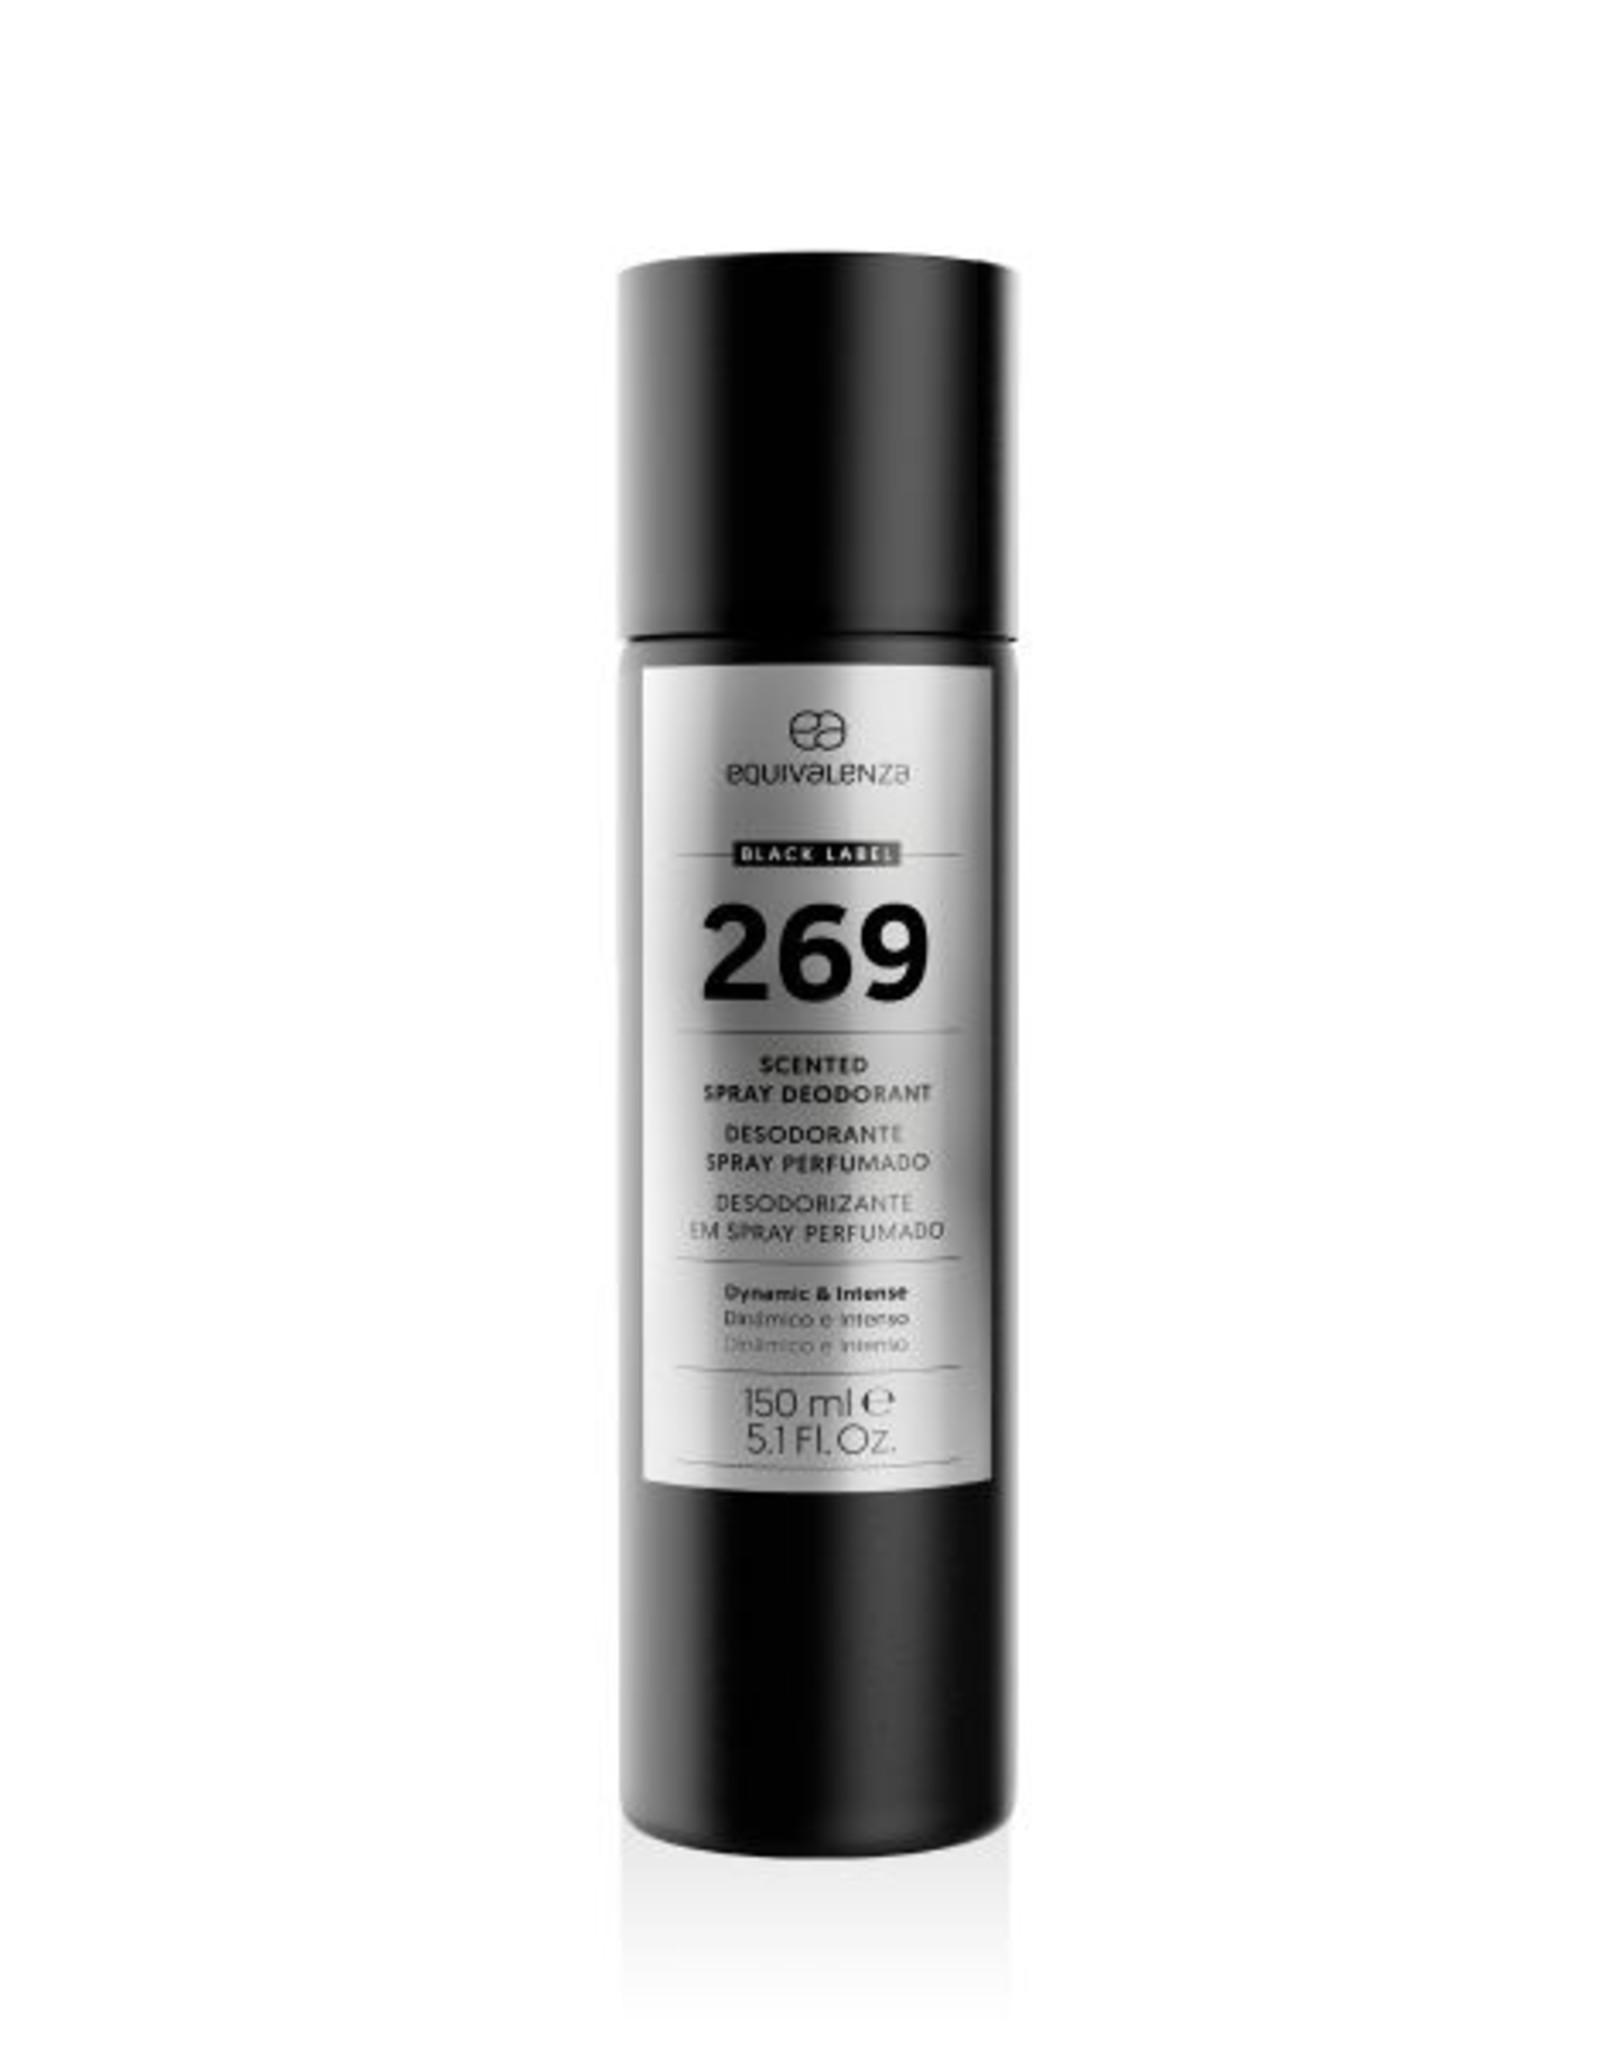 Equivalenza Black Label Deodorant 269